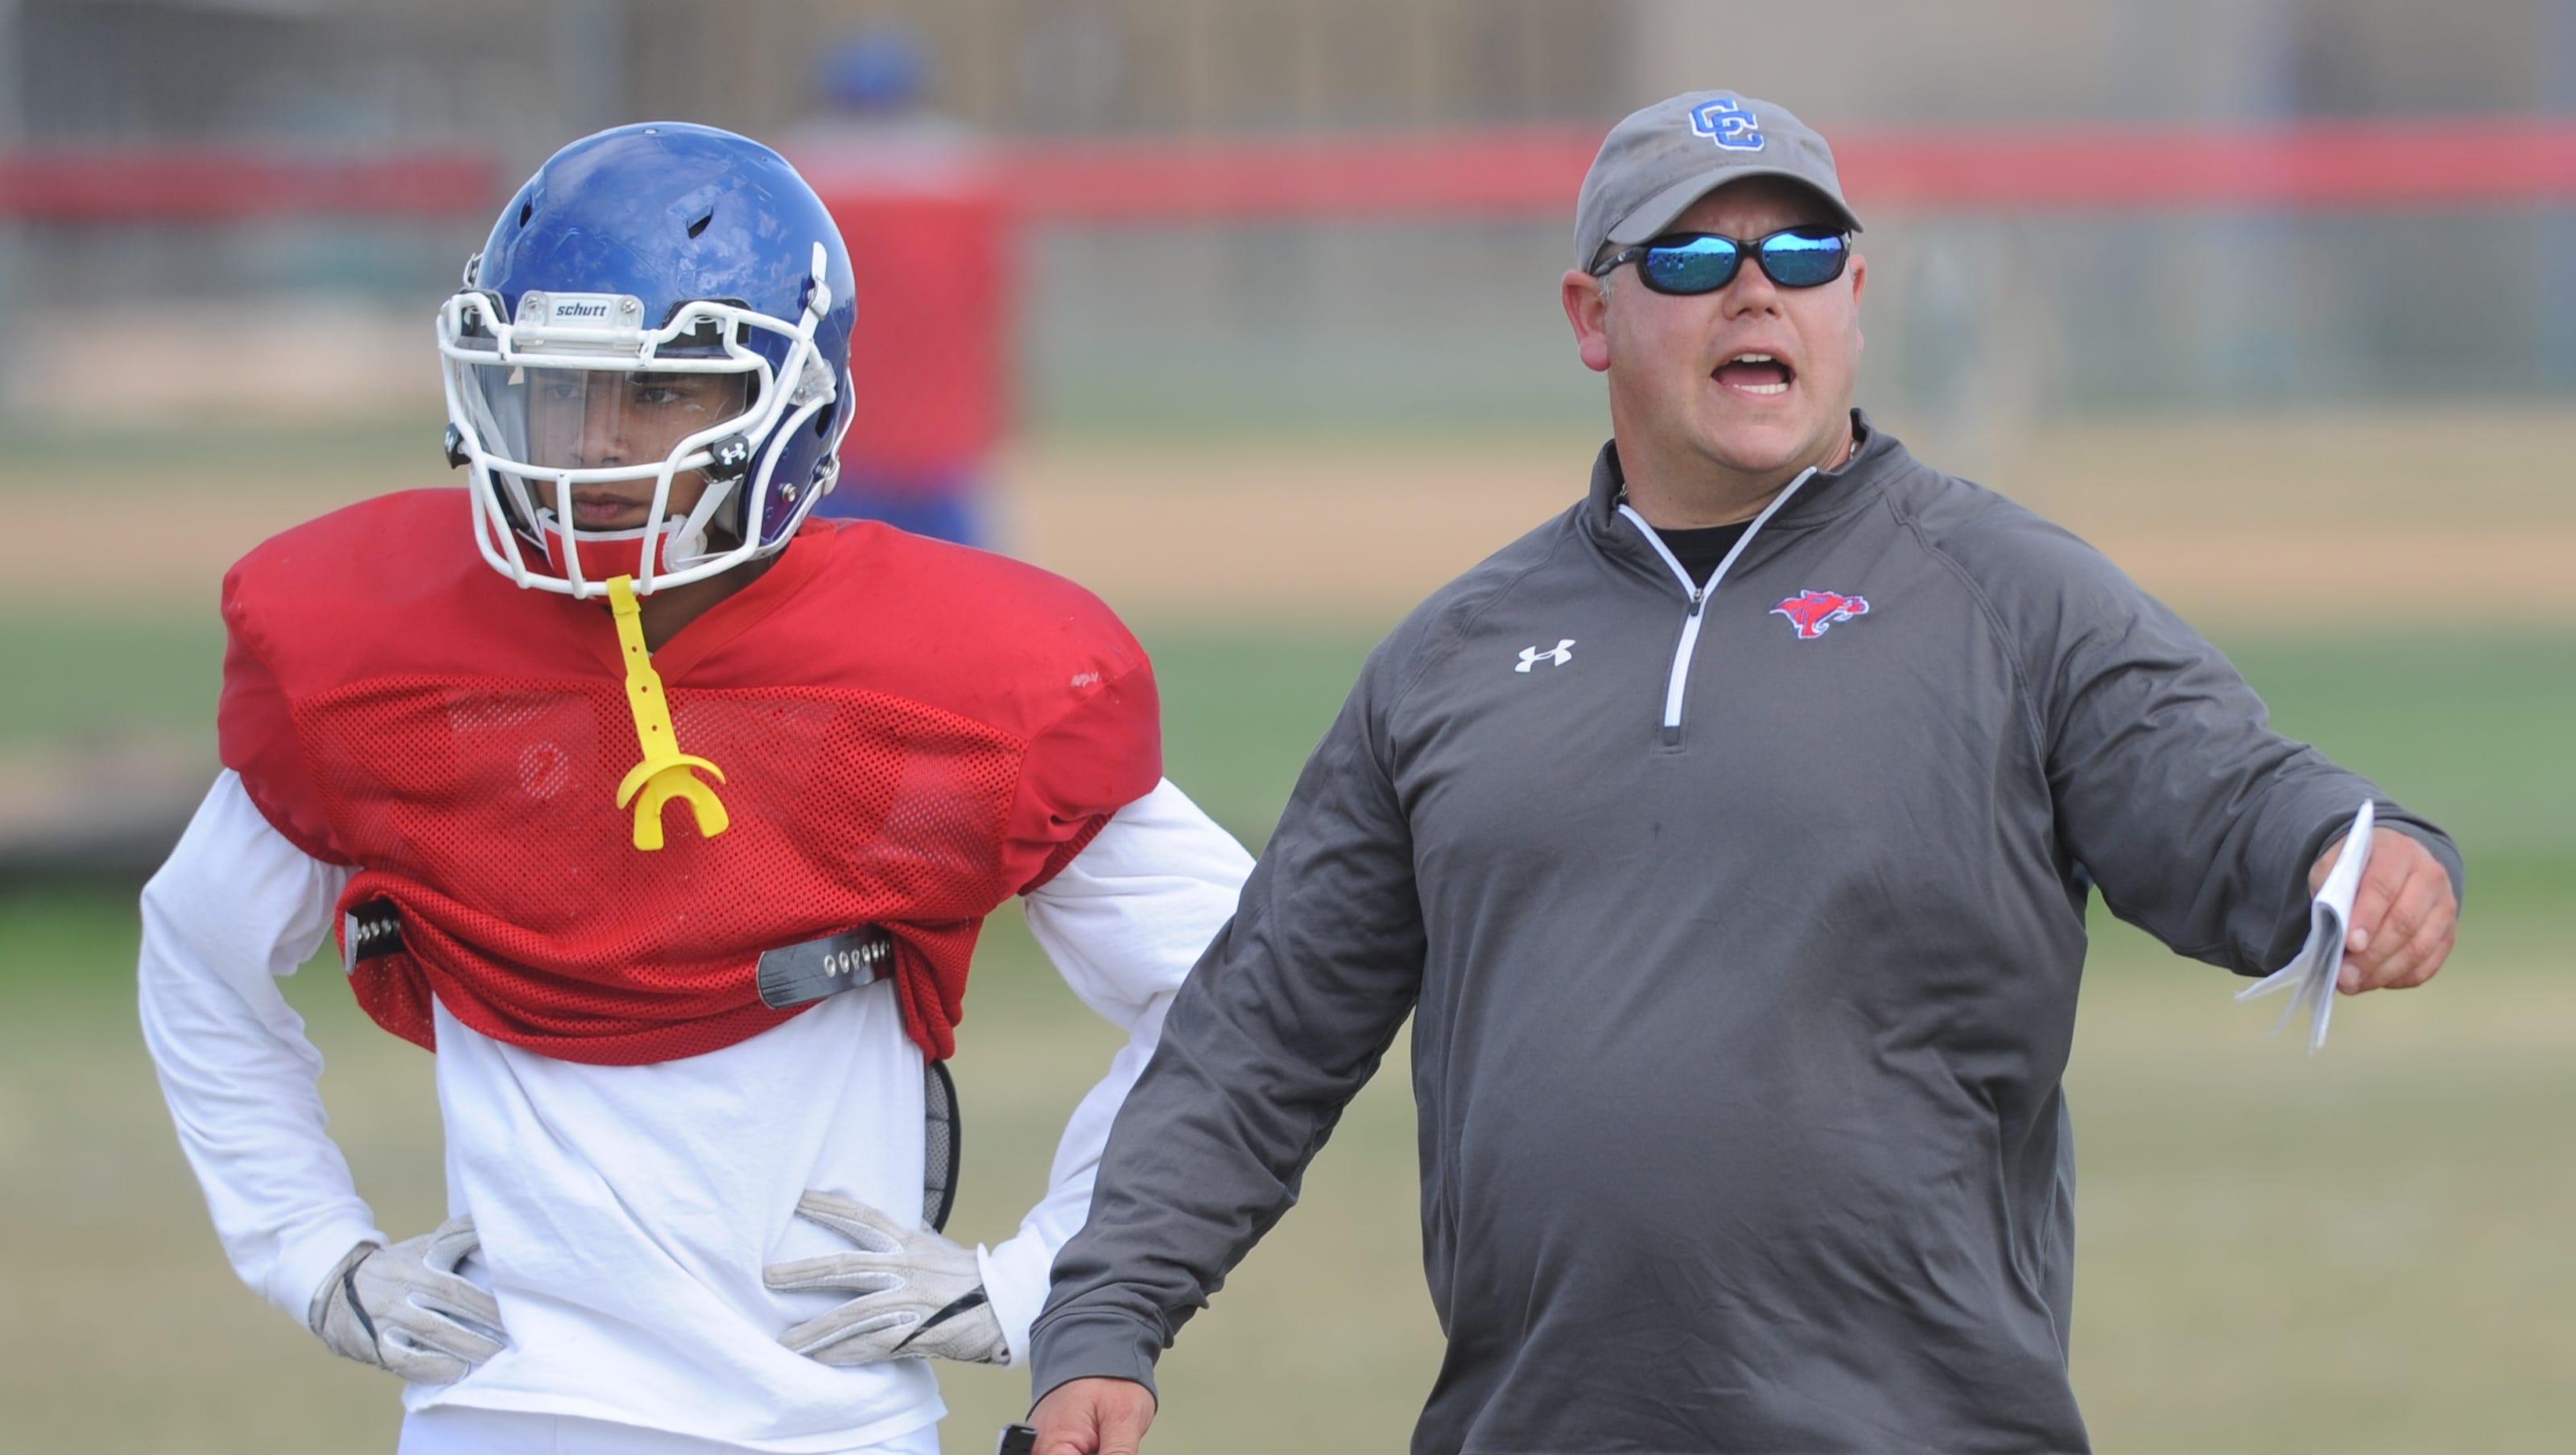 Cooper High Football Coach Moebes Resigns